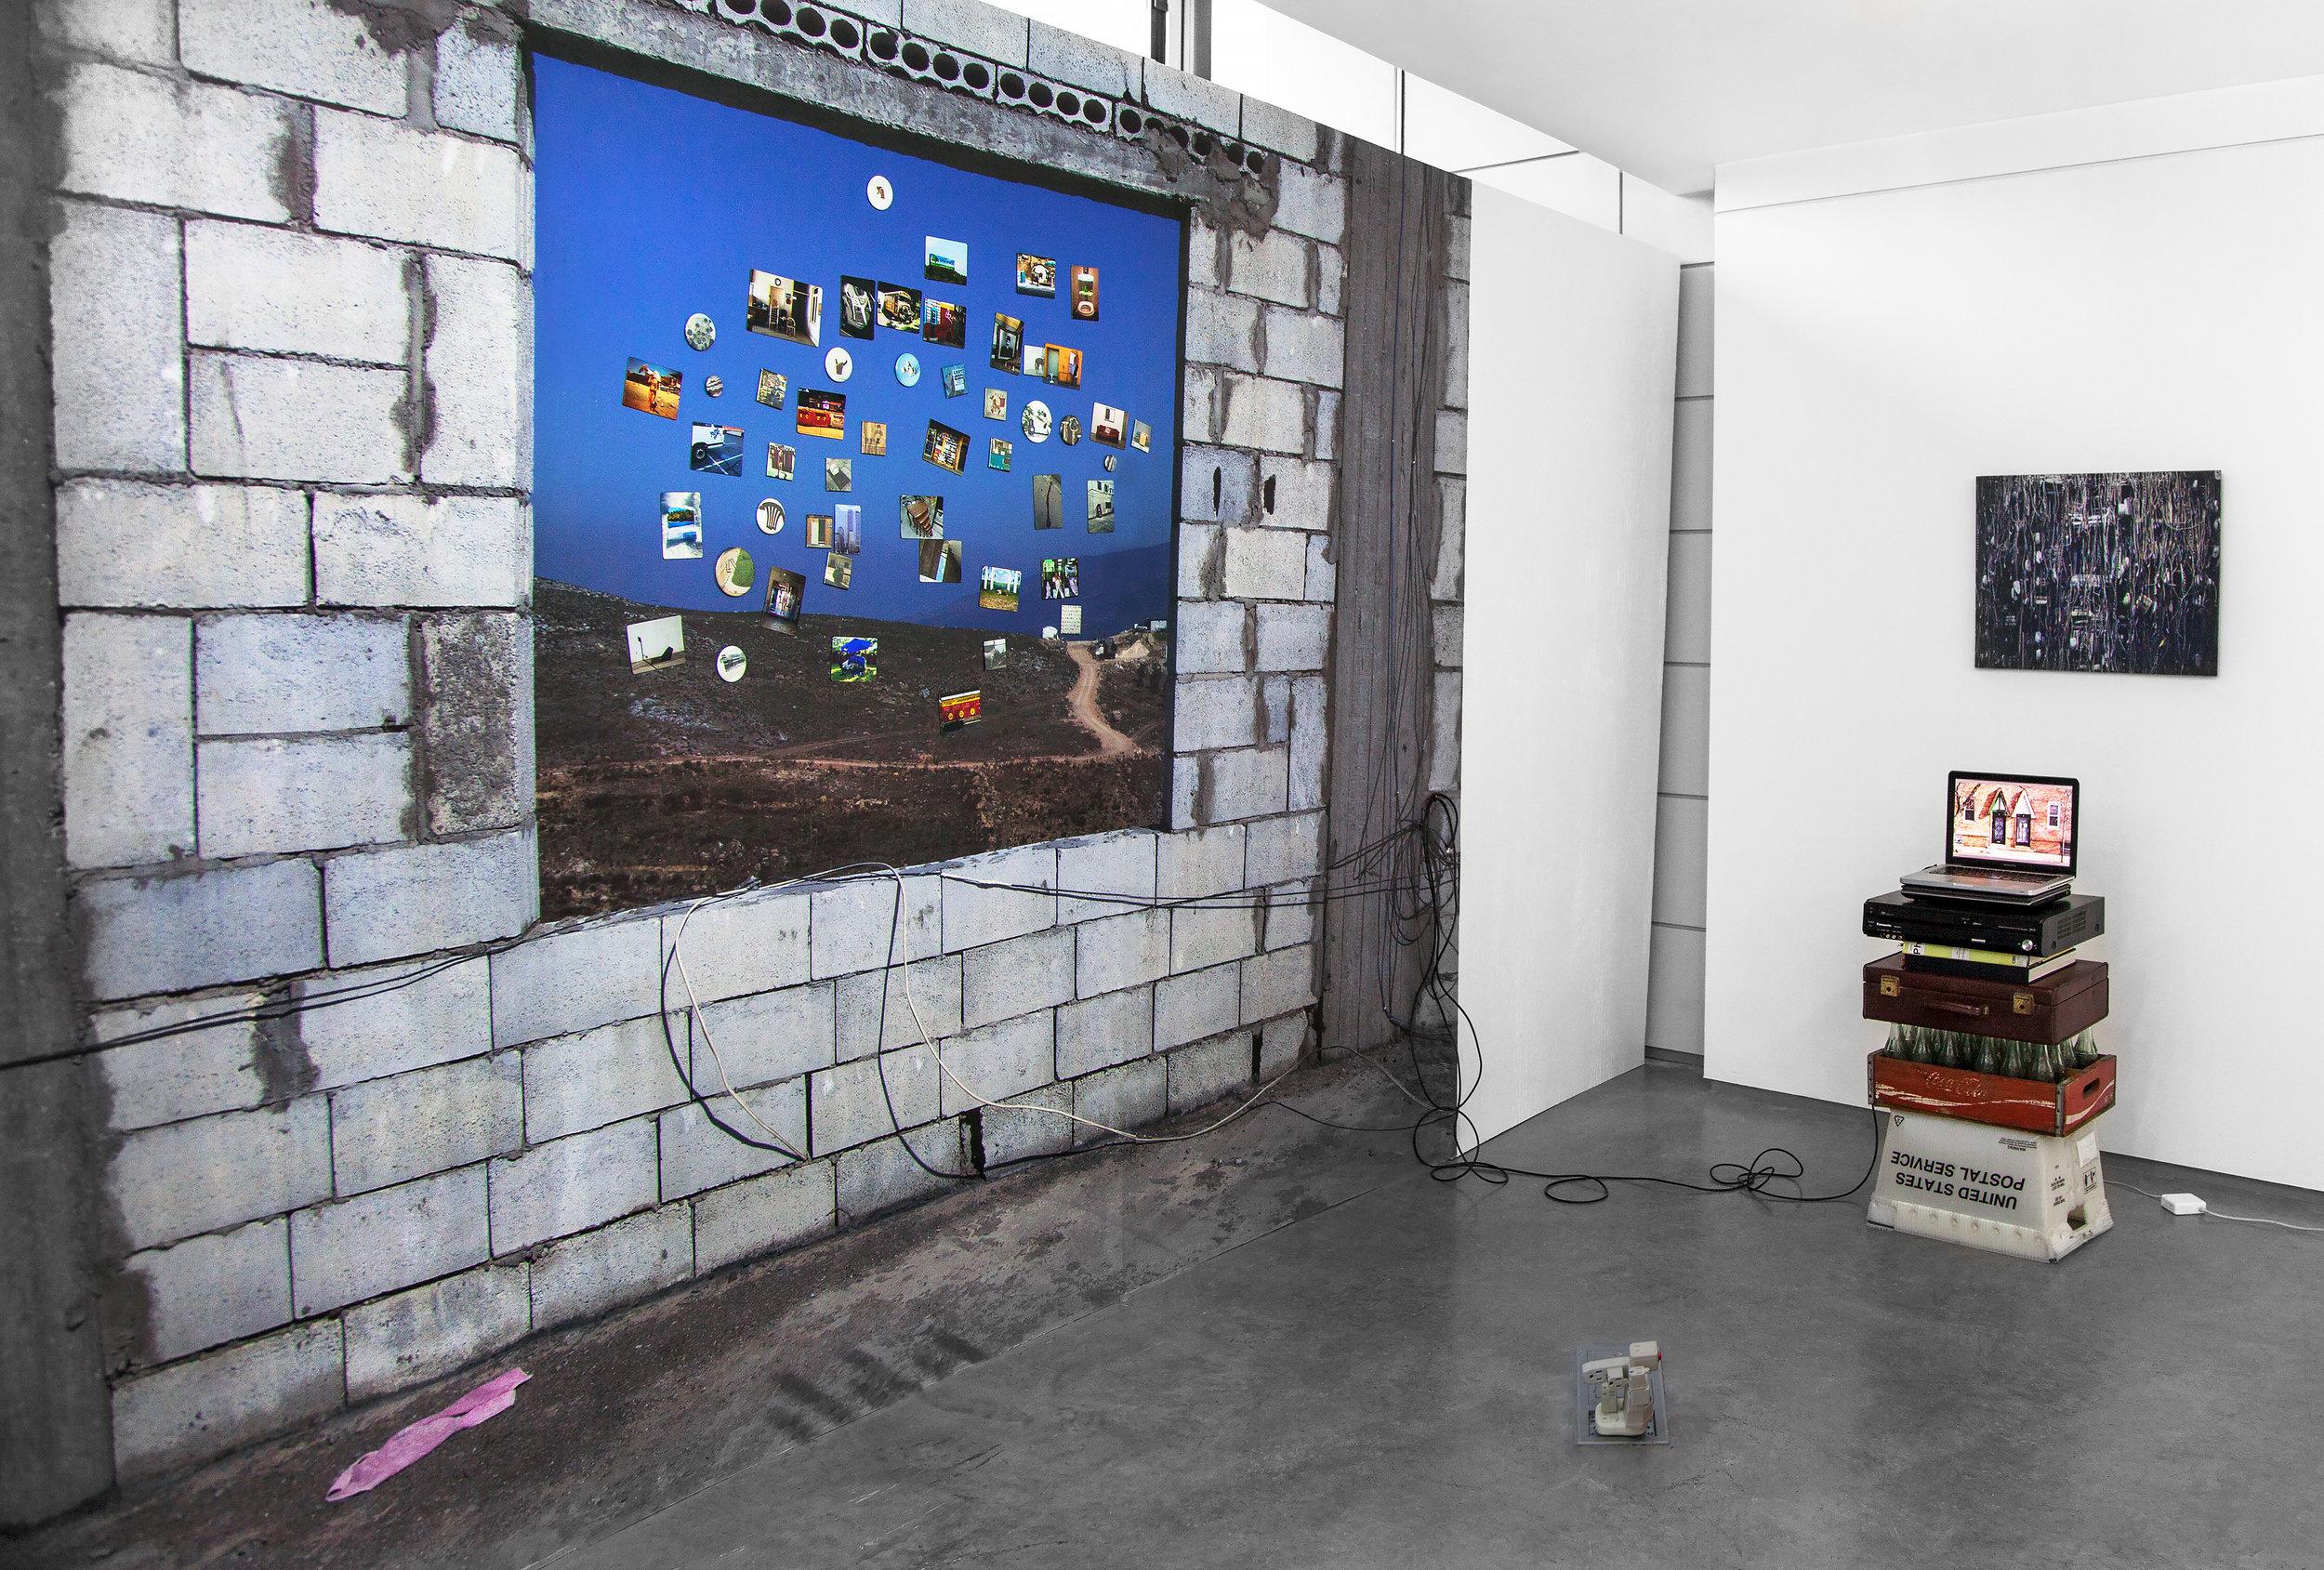 "Wallpaper ,   2014, magnetic primer, vinyl wallpaper, photo magnets, ethernet cord, 96""x 144"" (243.8 cm x 365.8 cm)"